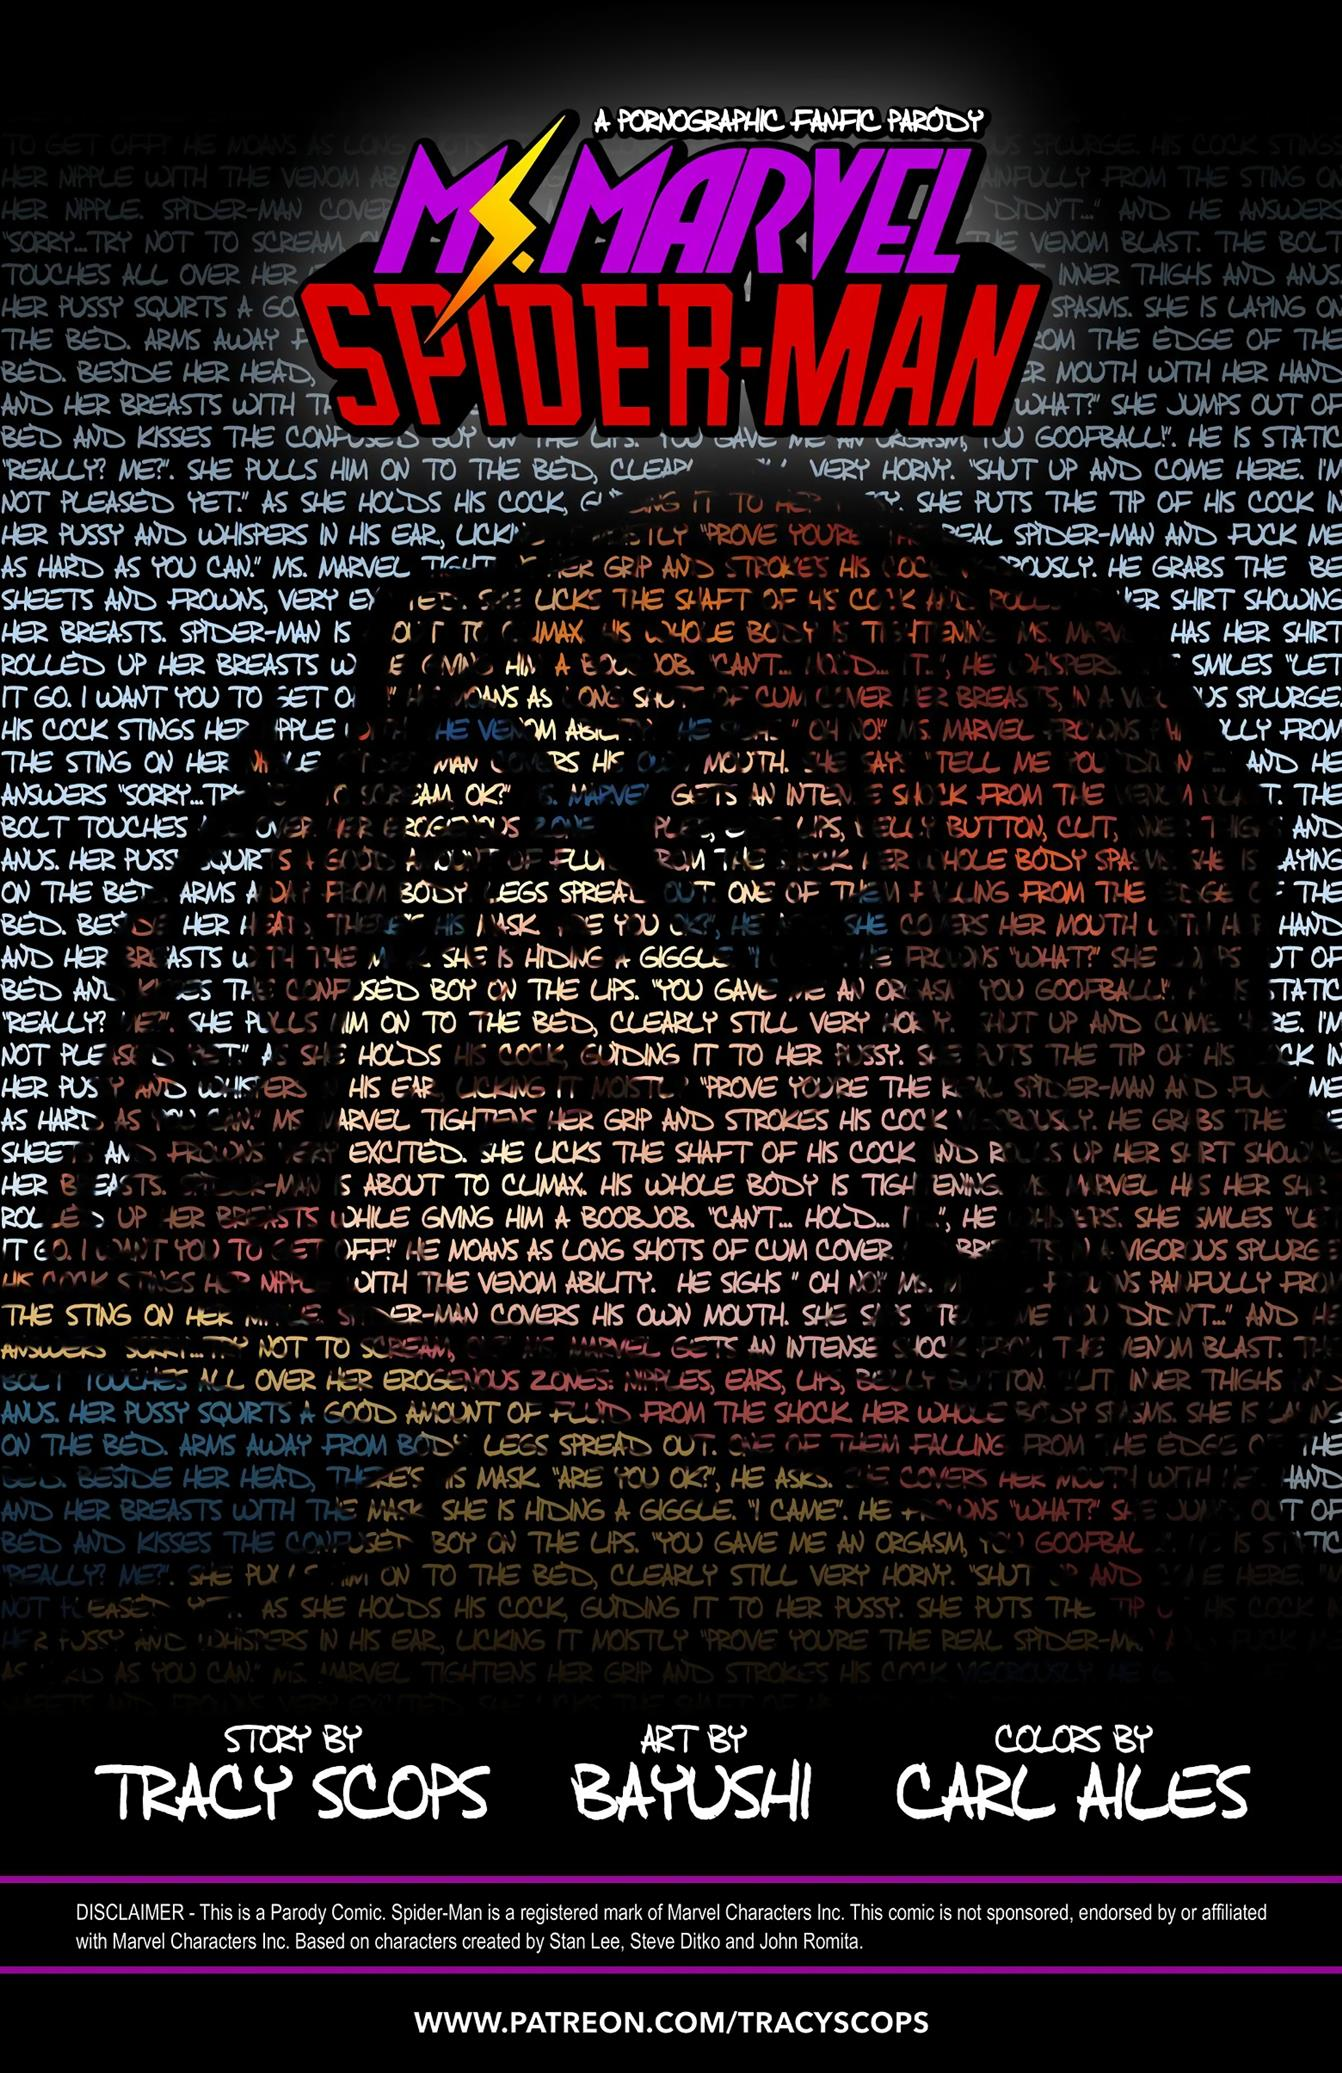 Ms.Marvel/Spiderman 1 [Tracy Scops] - Foto 2